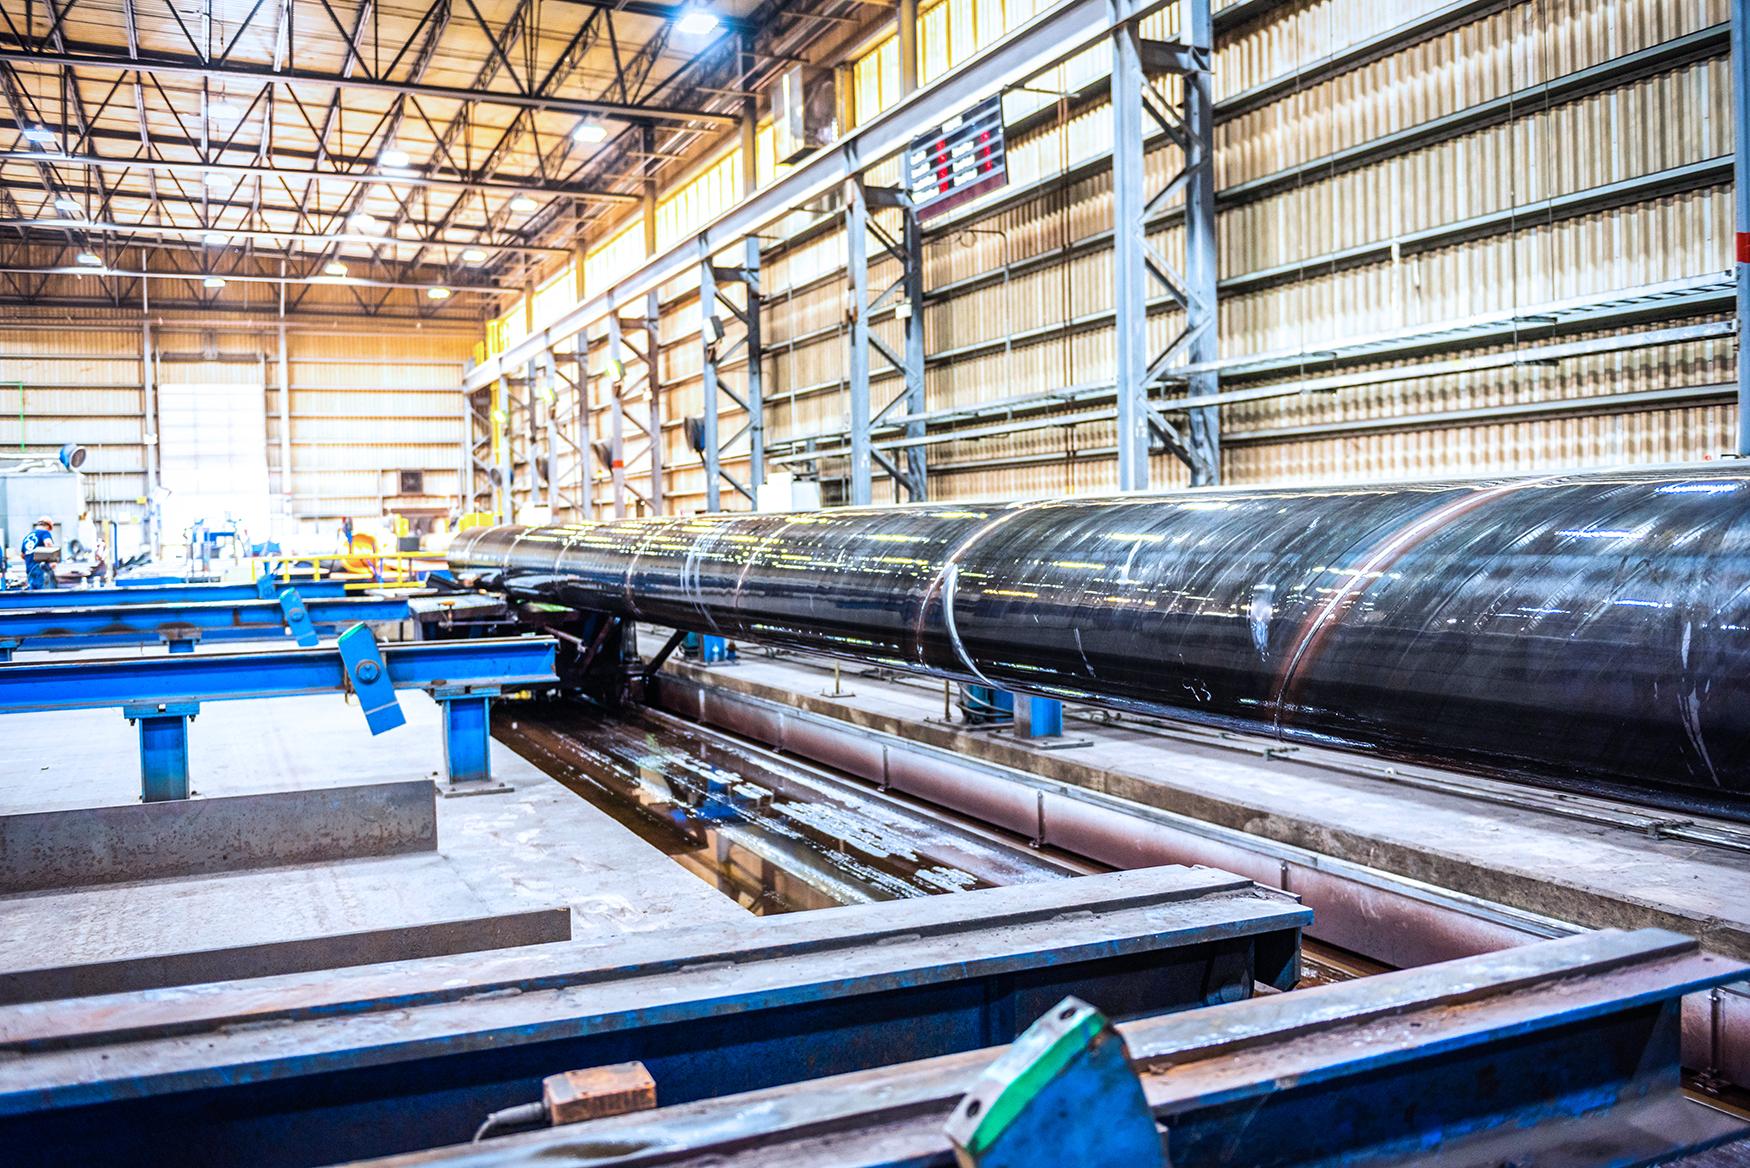 berg-pipe-pcbphotos-mobileDSC_2213-191.jpg